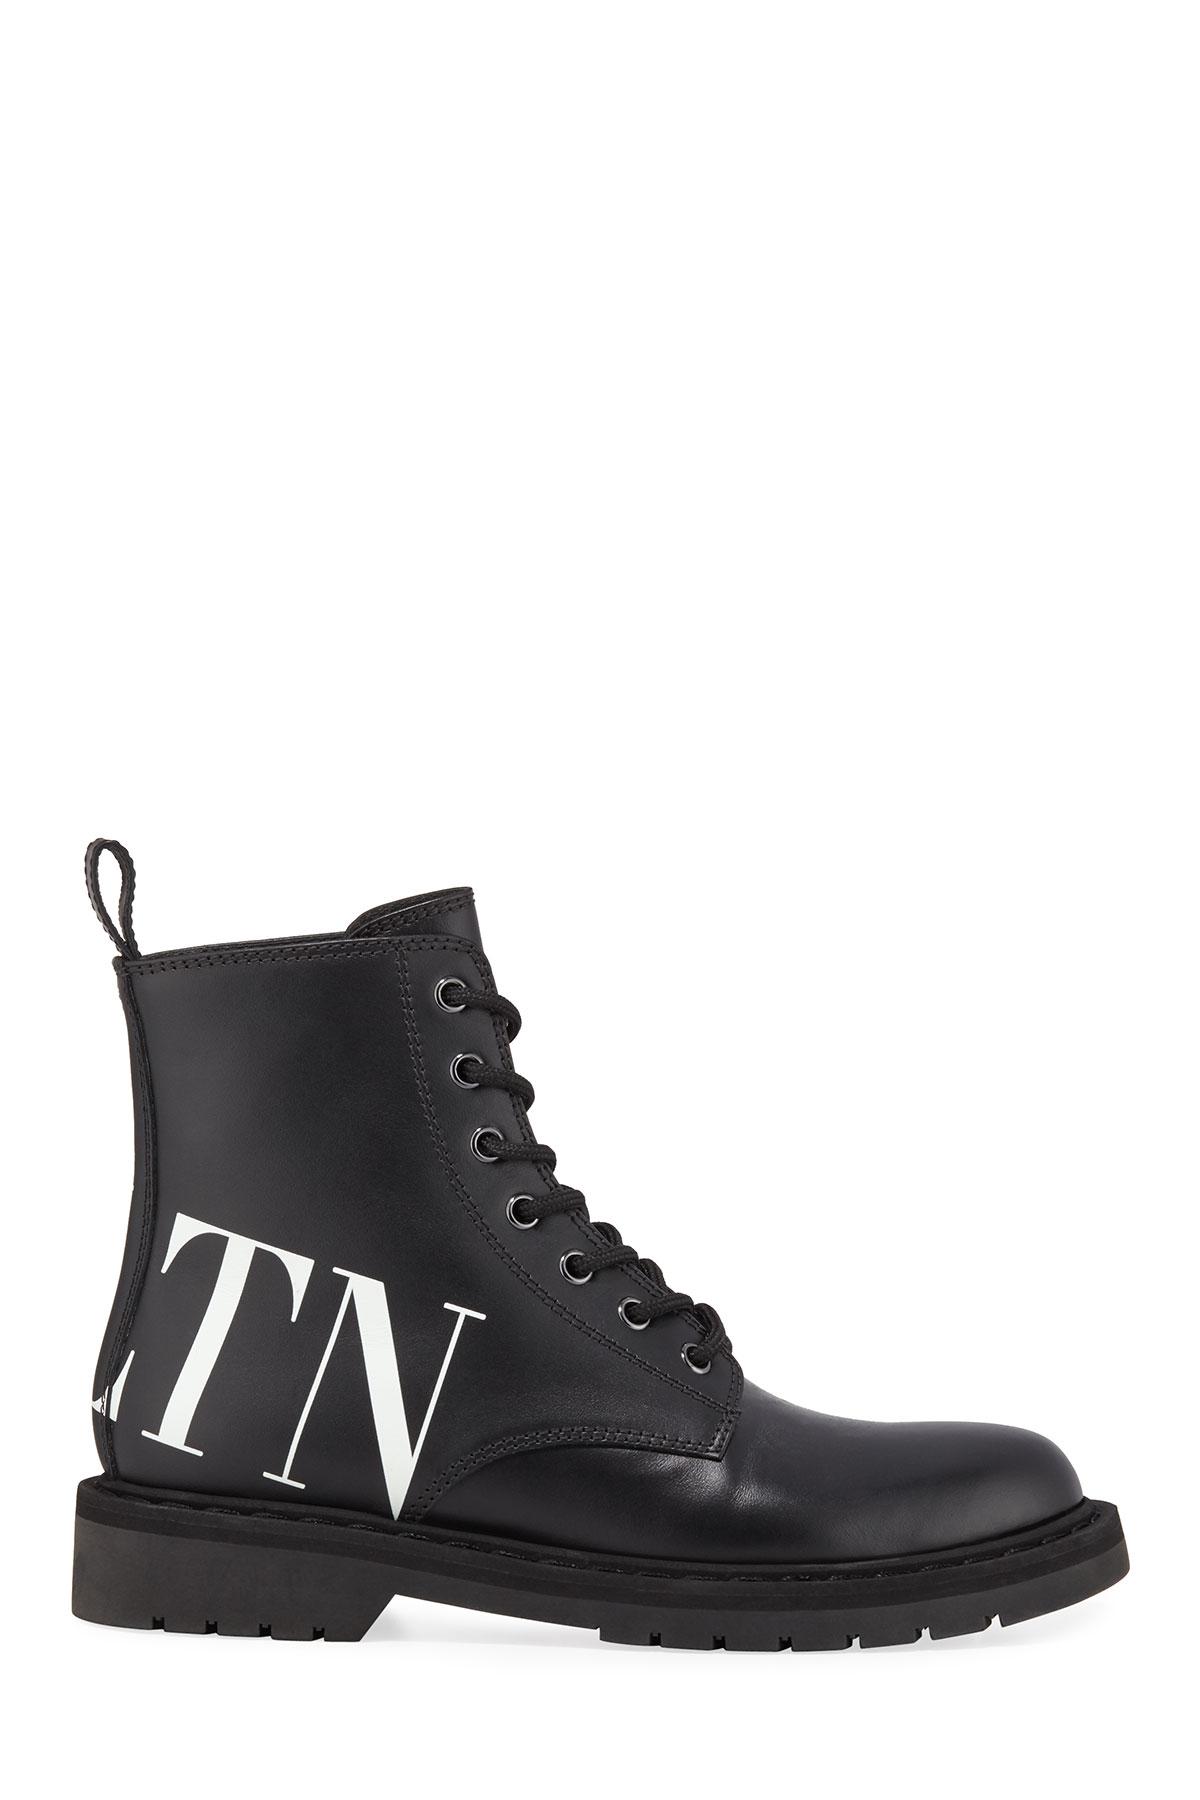 0599b03afde VLTN Leather Combat Boots